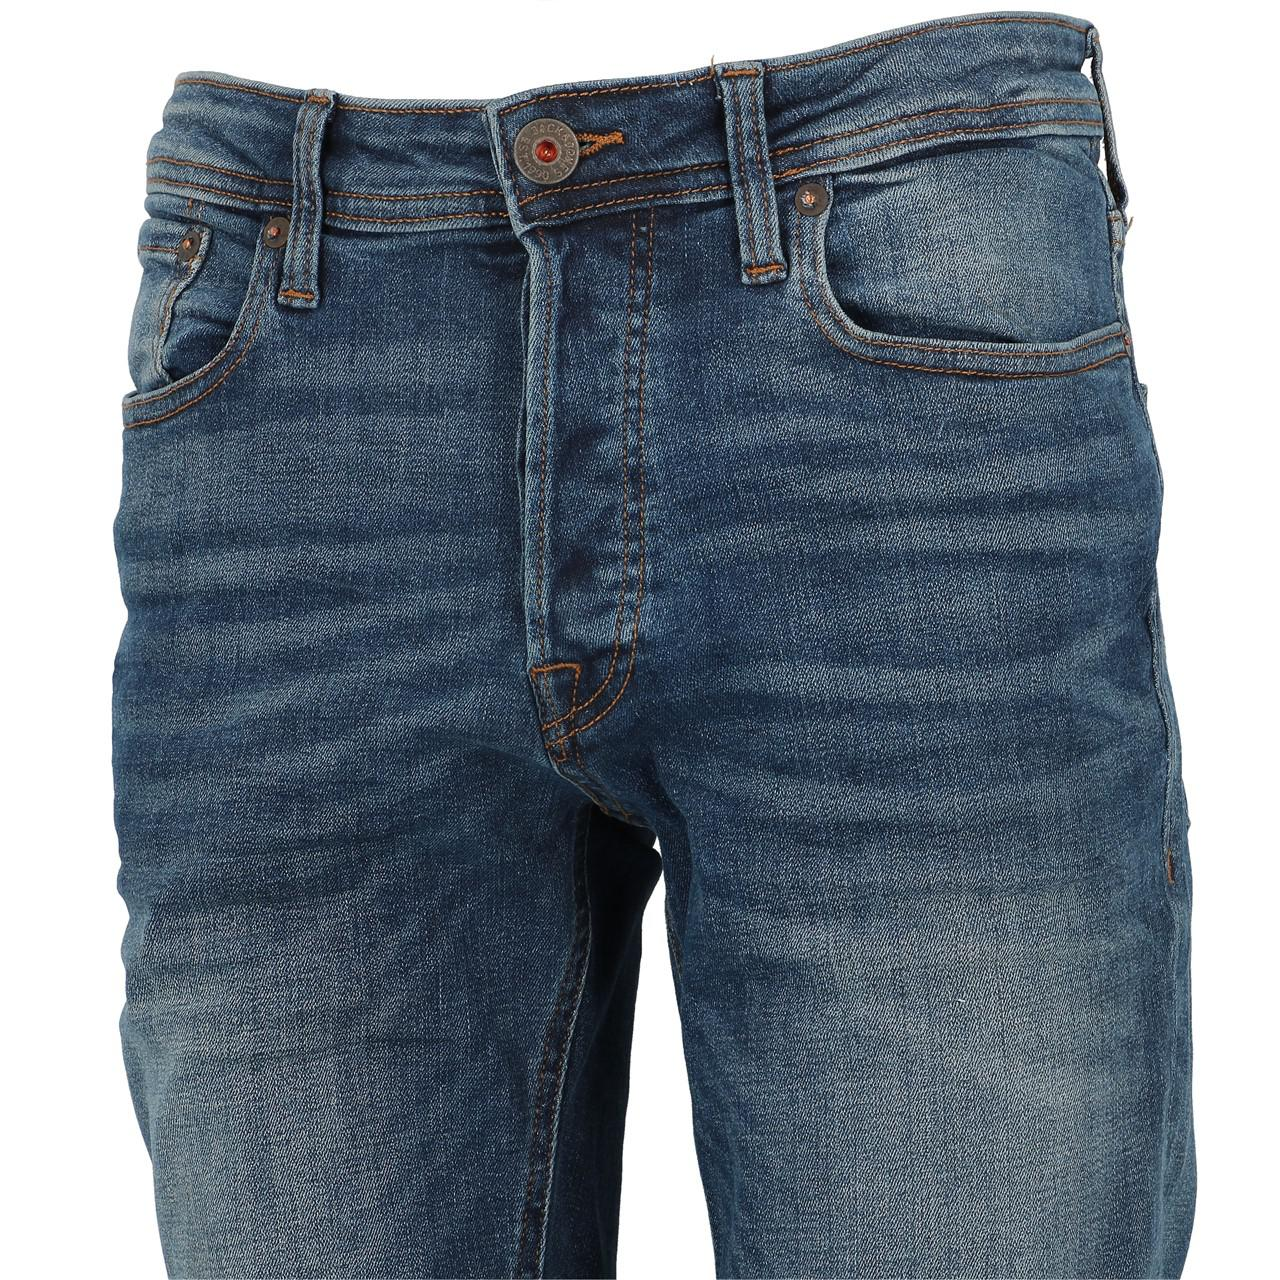 Jeans-Pants-Jack-and-jones-Tim-34-Blue-Denim-Blue-Jeans-19918-New thumbnail 4